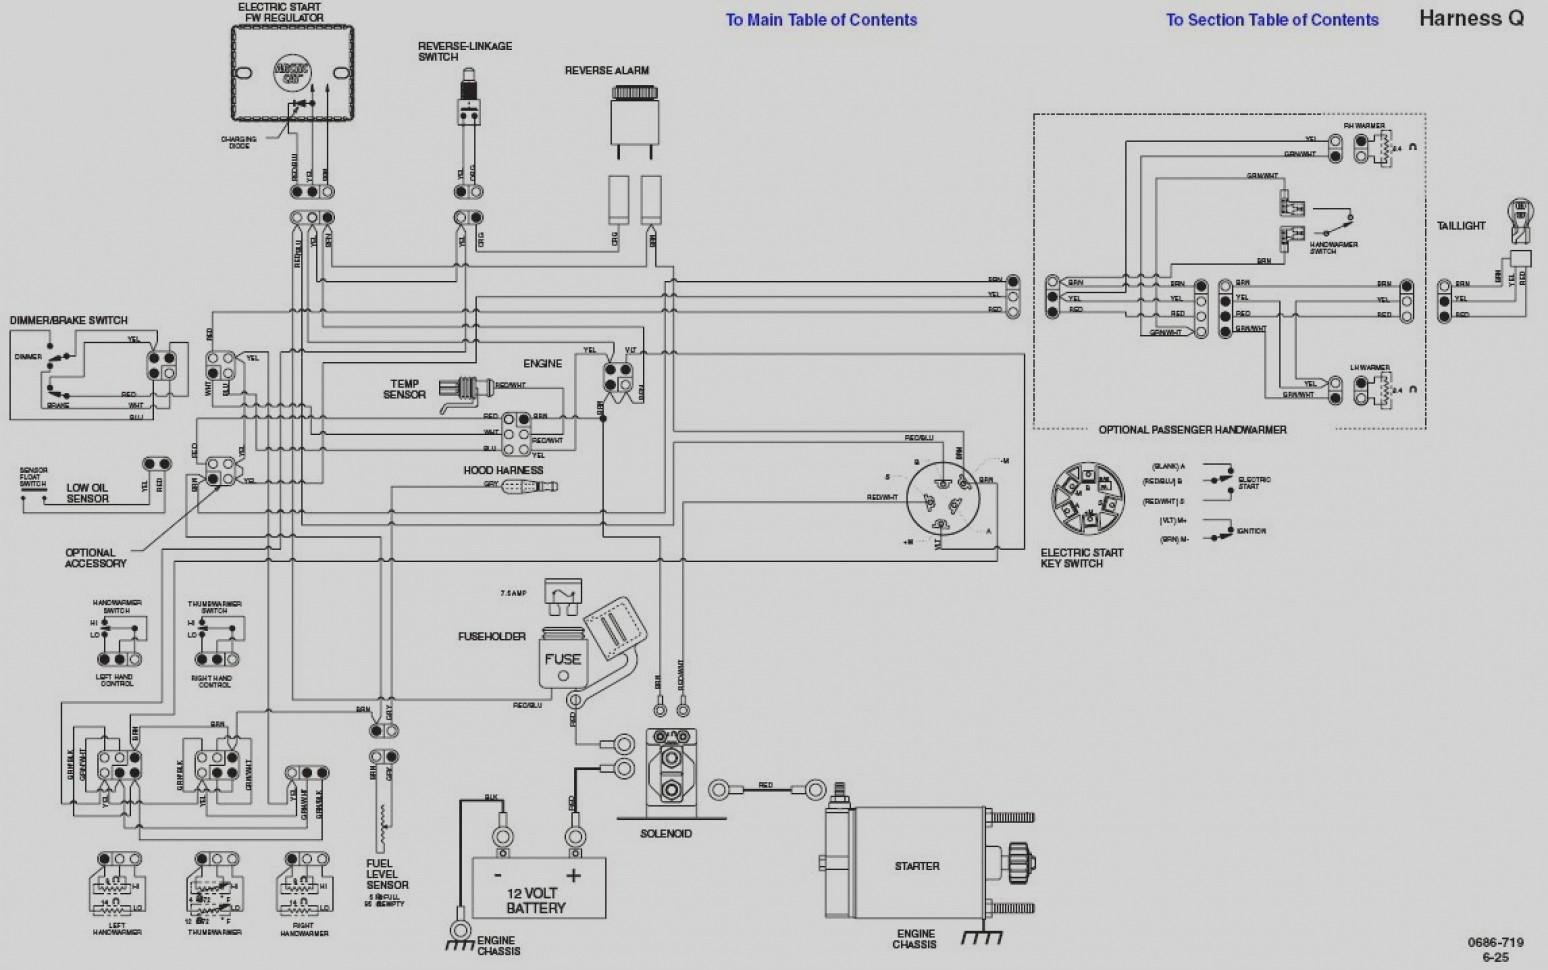 polaris ranger wiring diagram wiring diagram image rh mainetreasurechest com 2011 polaris ranger 500 wiring diagram 2011 polaris ranger 500 wiring diagram